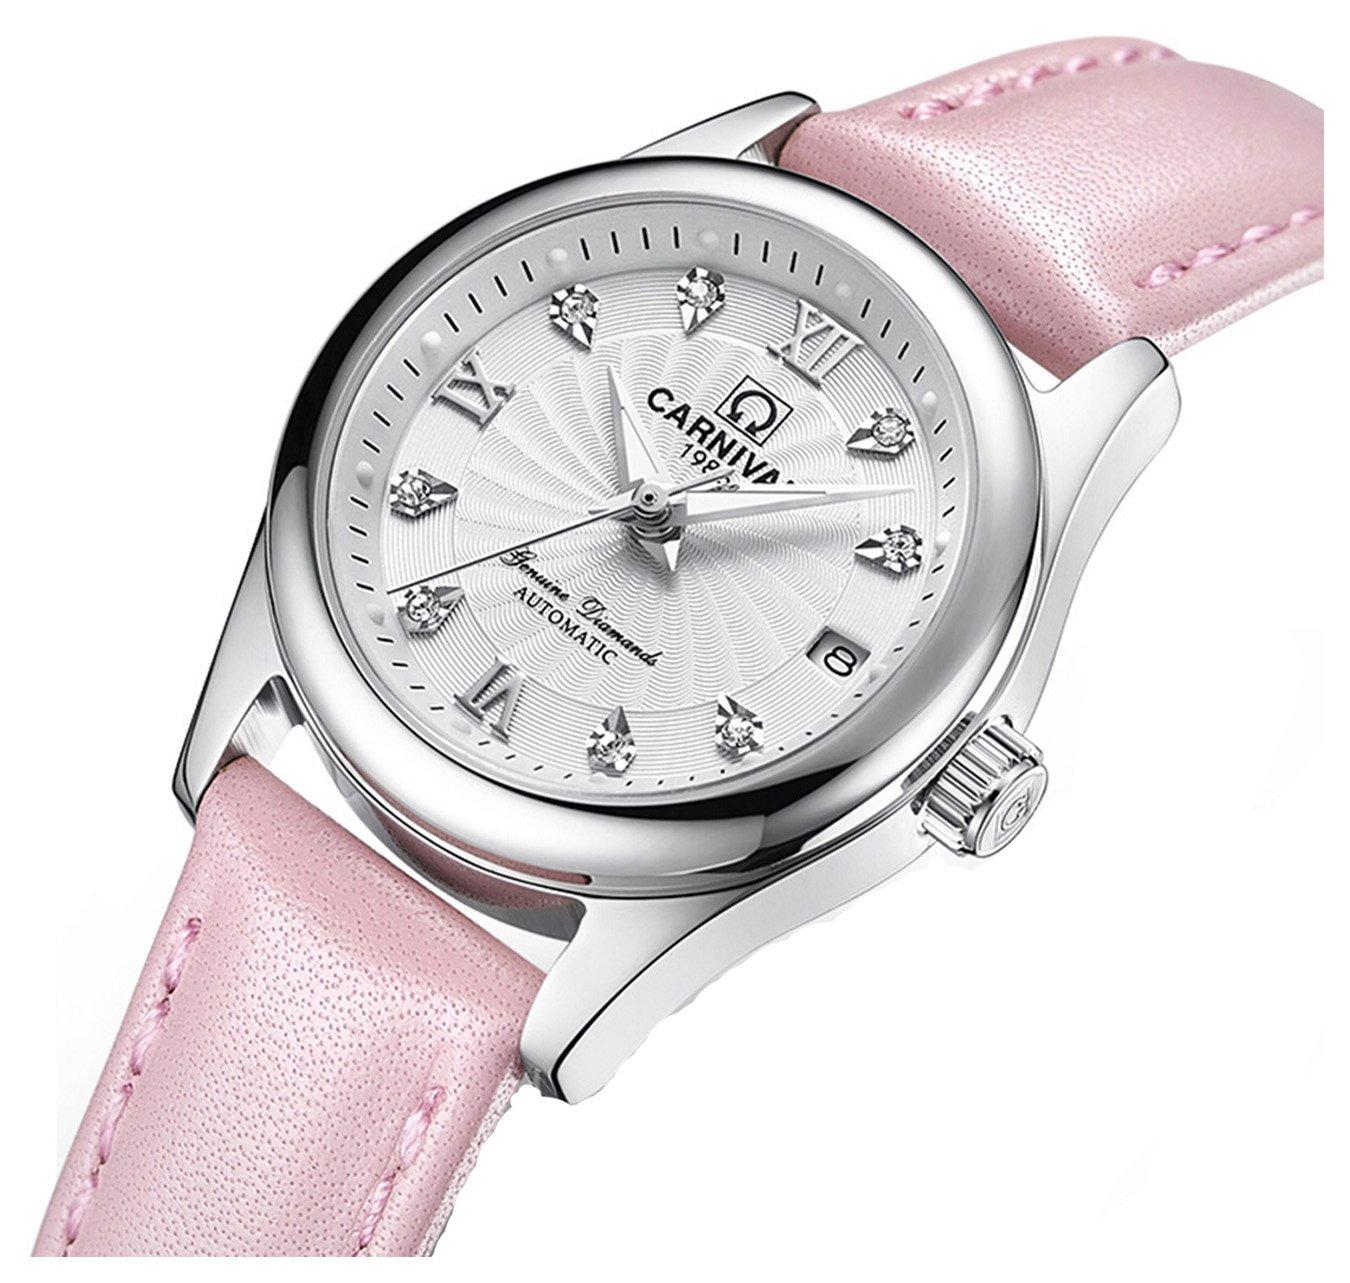 Luxury Women 's Automatic Mechanical Luminousカレンダーダイヤモンド本革防水Girls Watches ピンクシルバー B077CNYCC1 ピンクシルバー ピンクシルバー